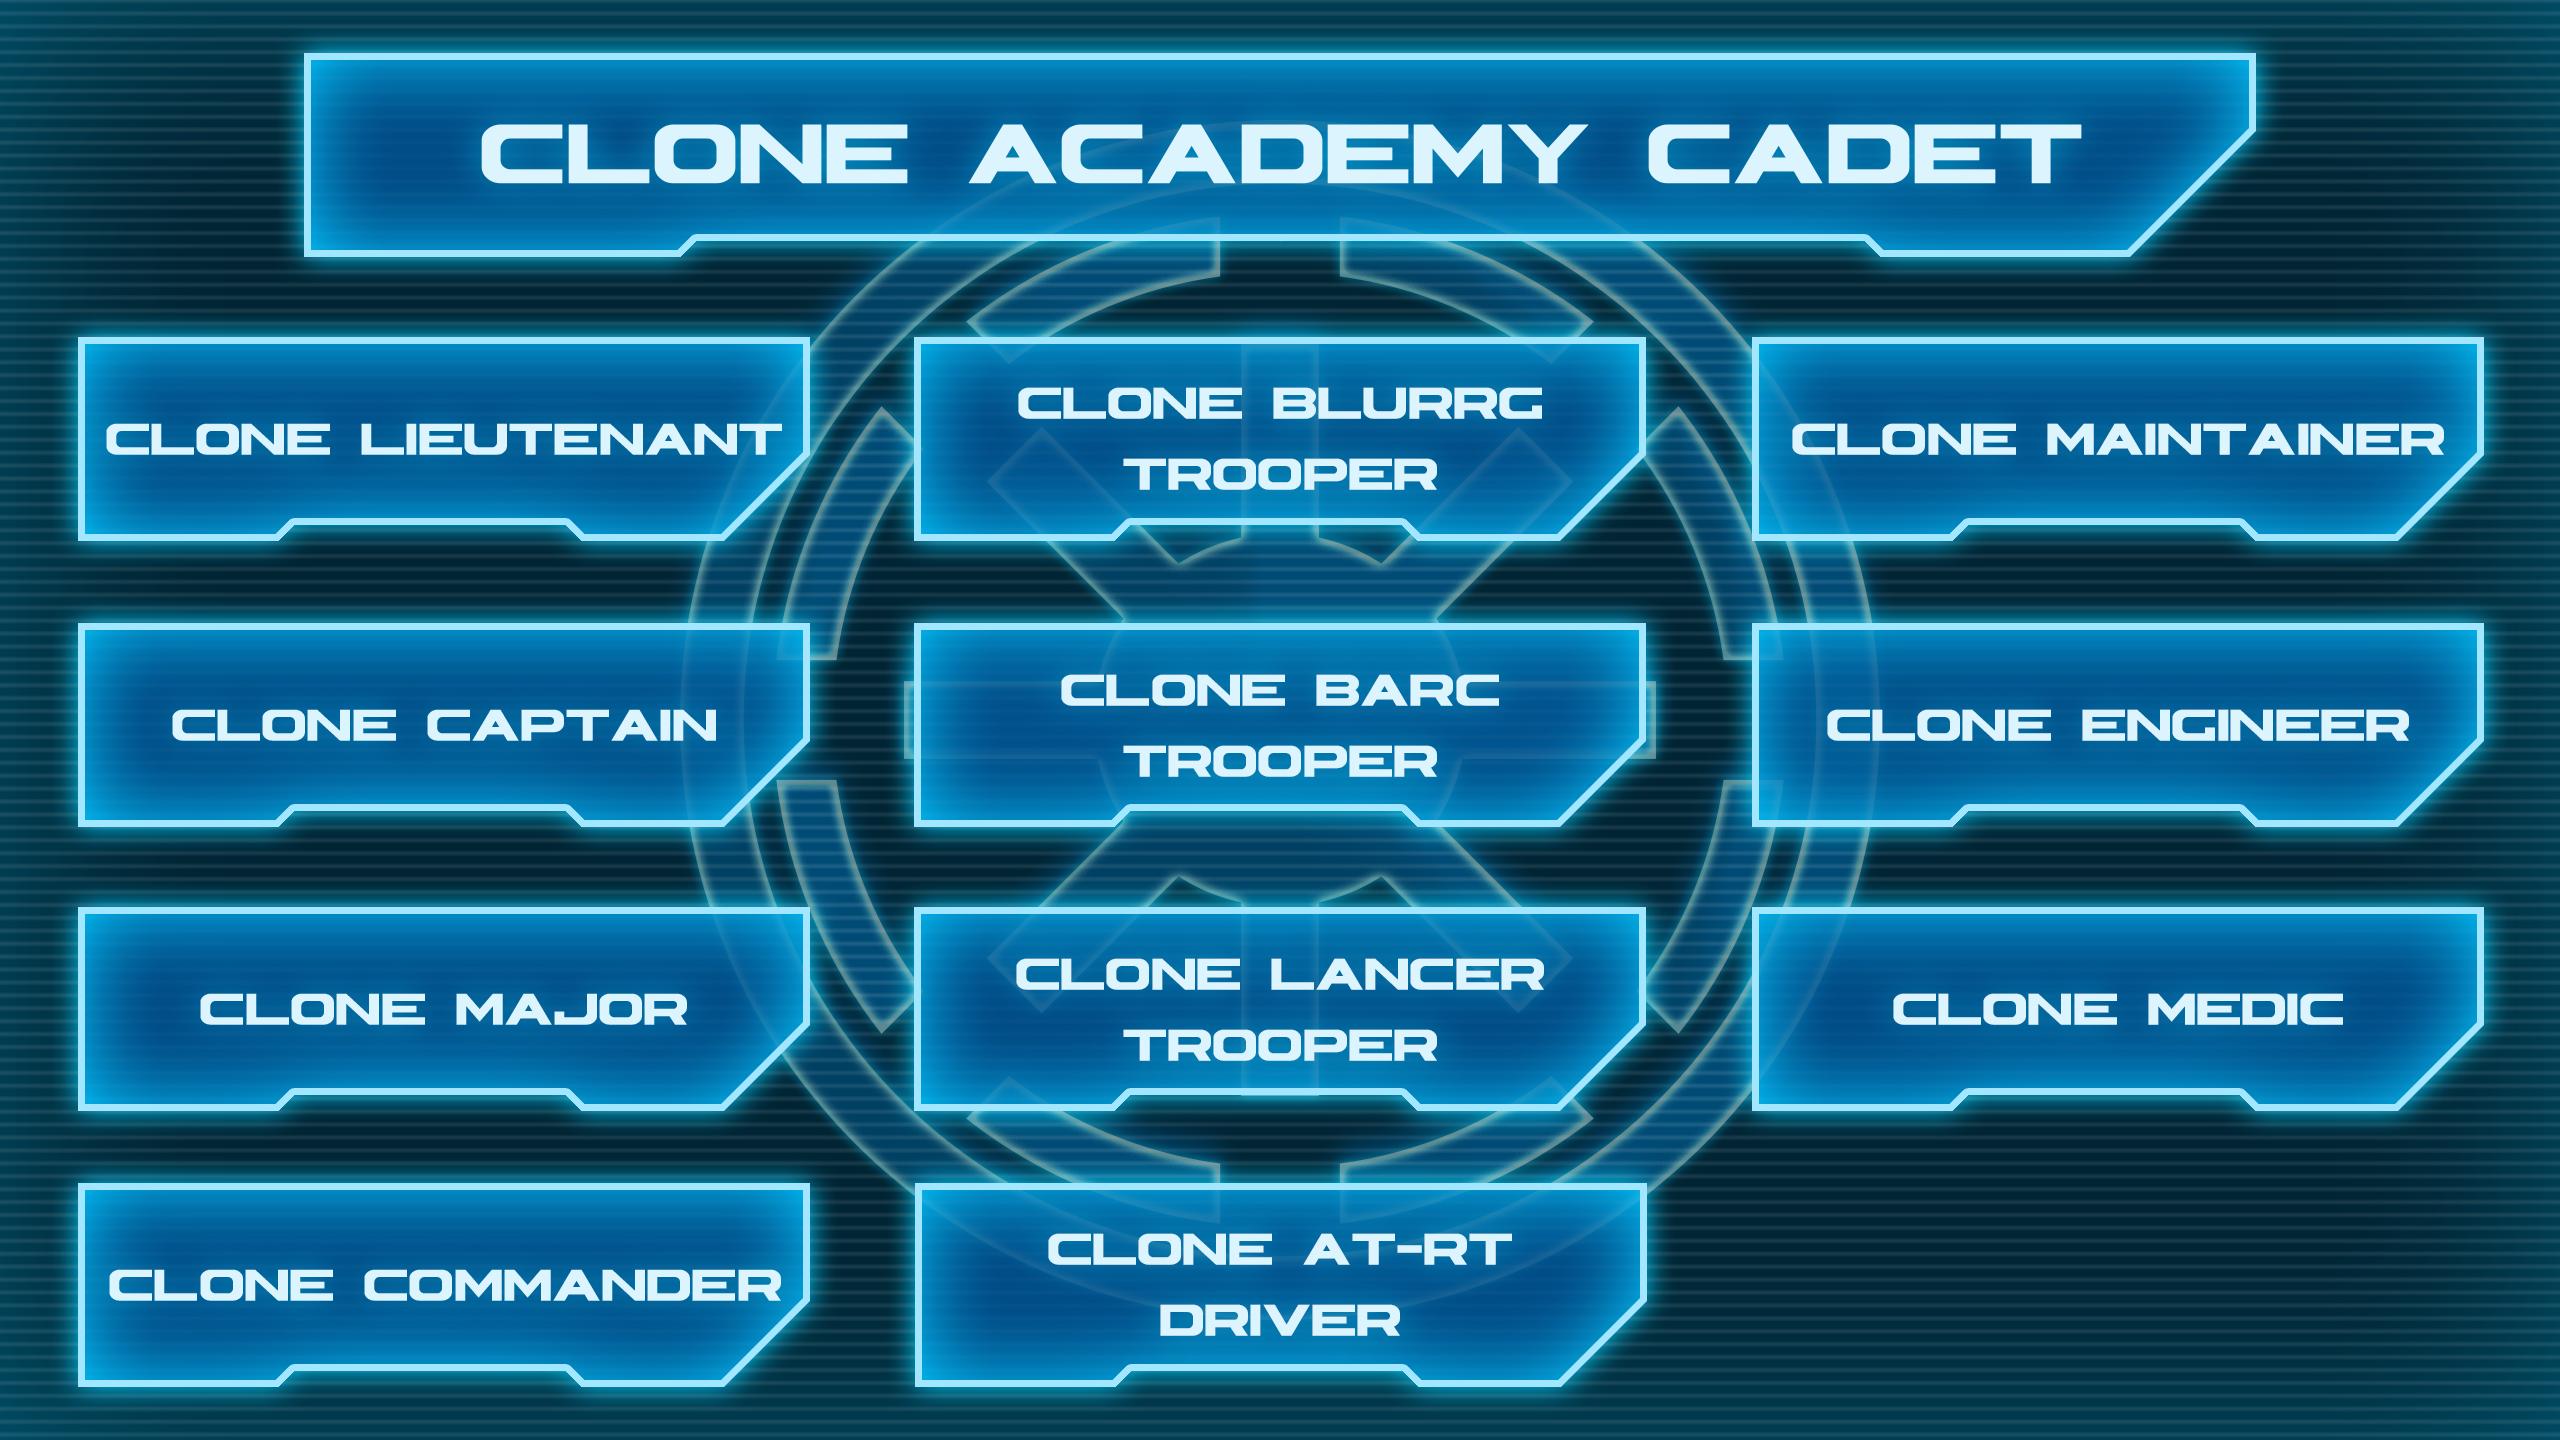 Clone Academy Cadet Tree 2